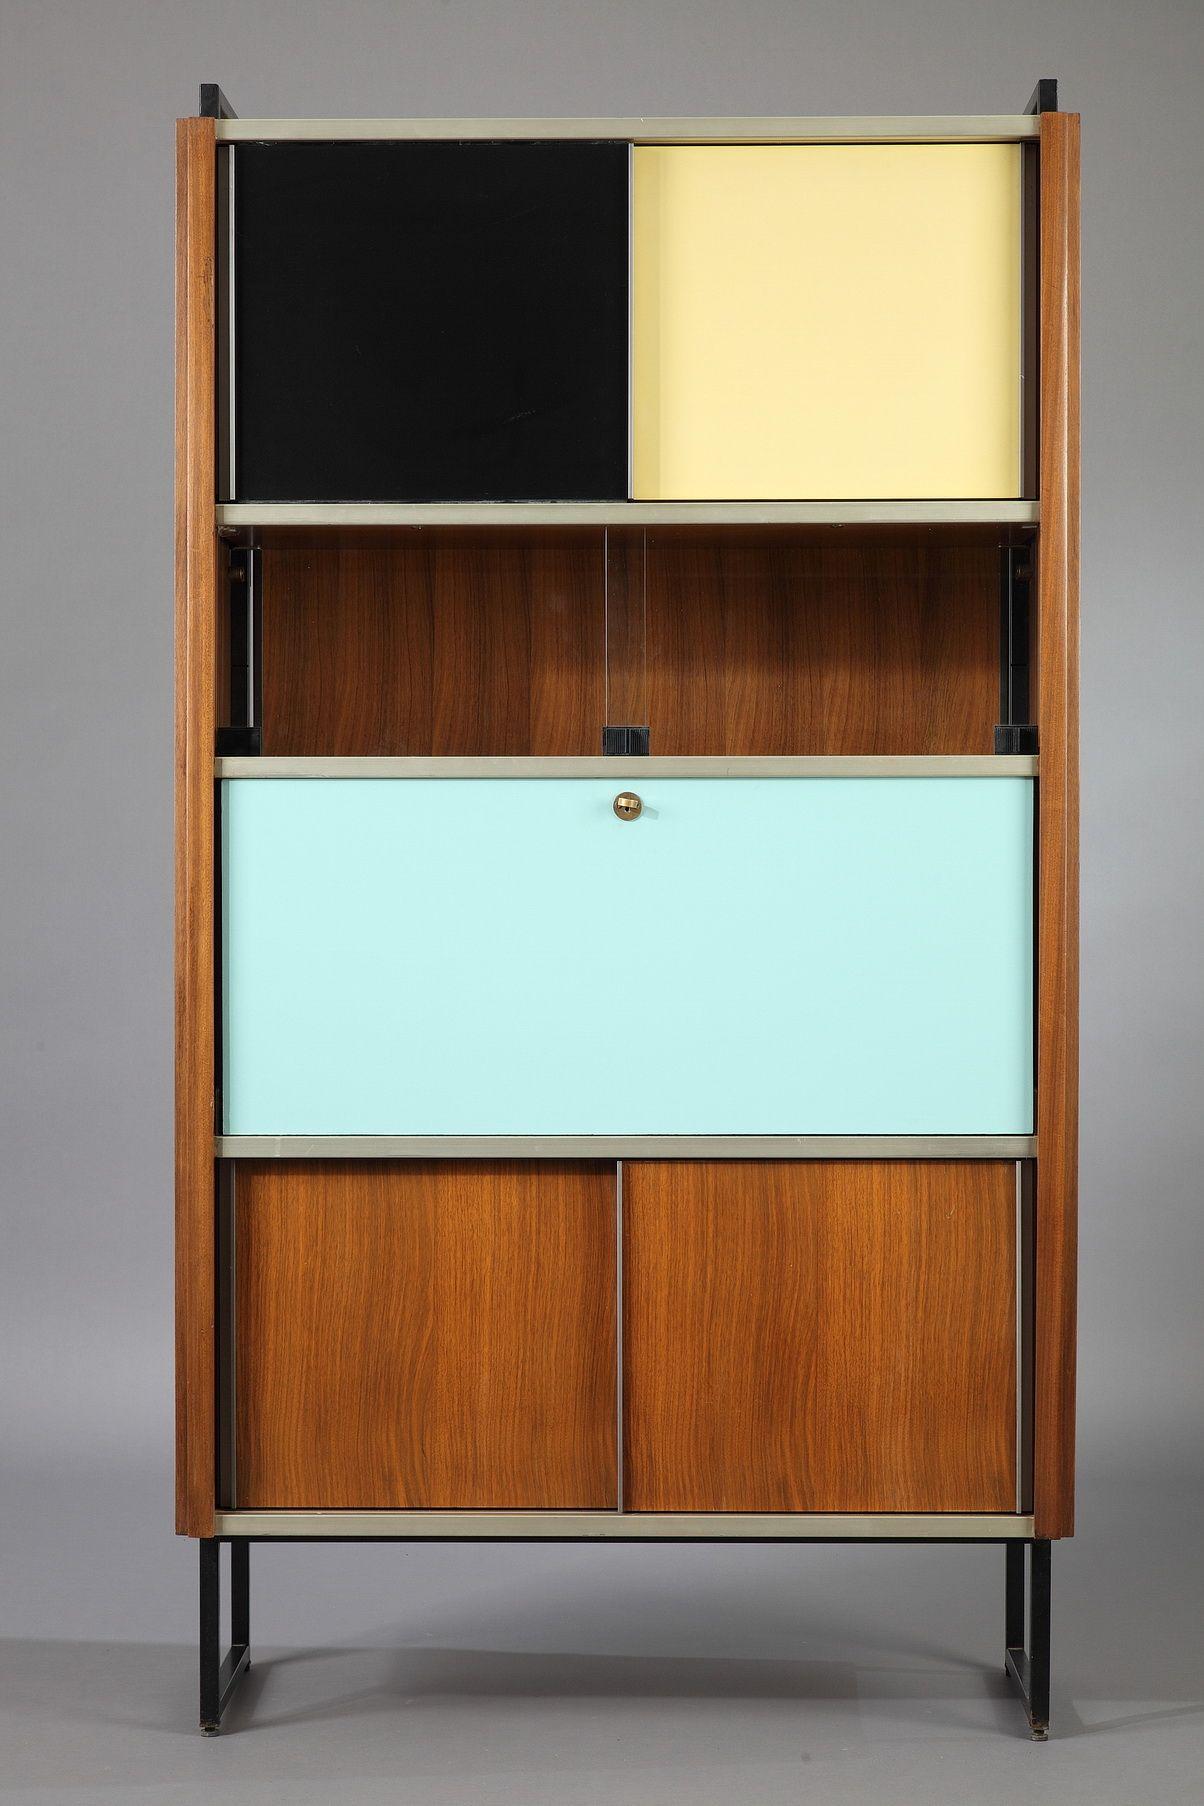 Efa Secretaire Bookcase In Rosewood By Georges Frydman 1955  # Bibliotheque En Vitre Aluminium